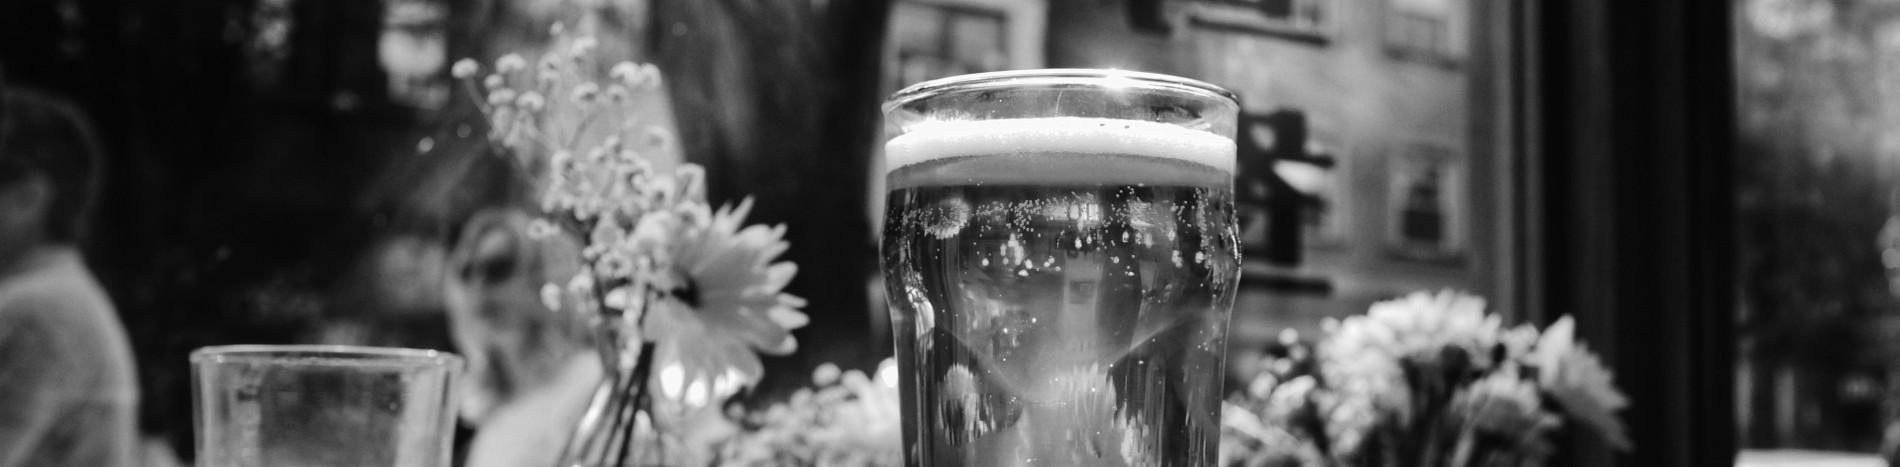 Manchester Beer Week 2018